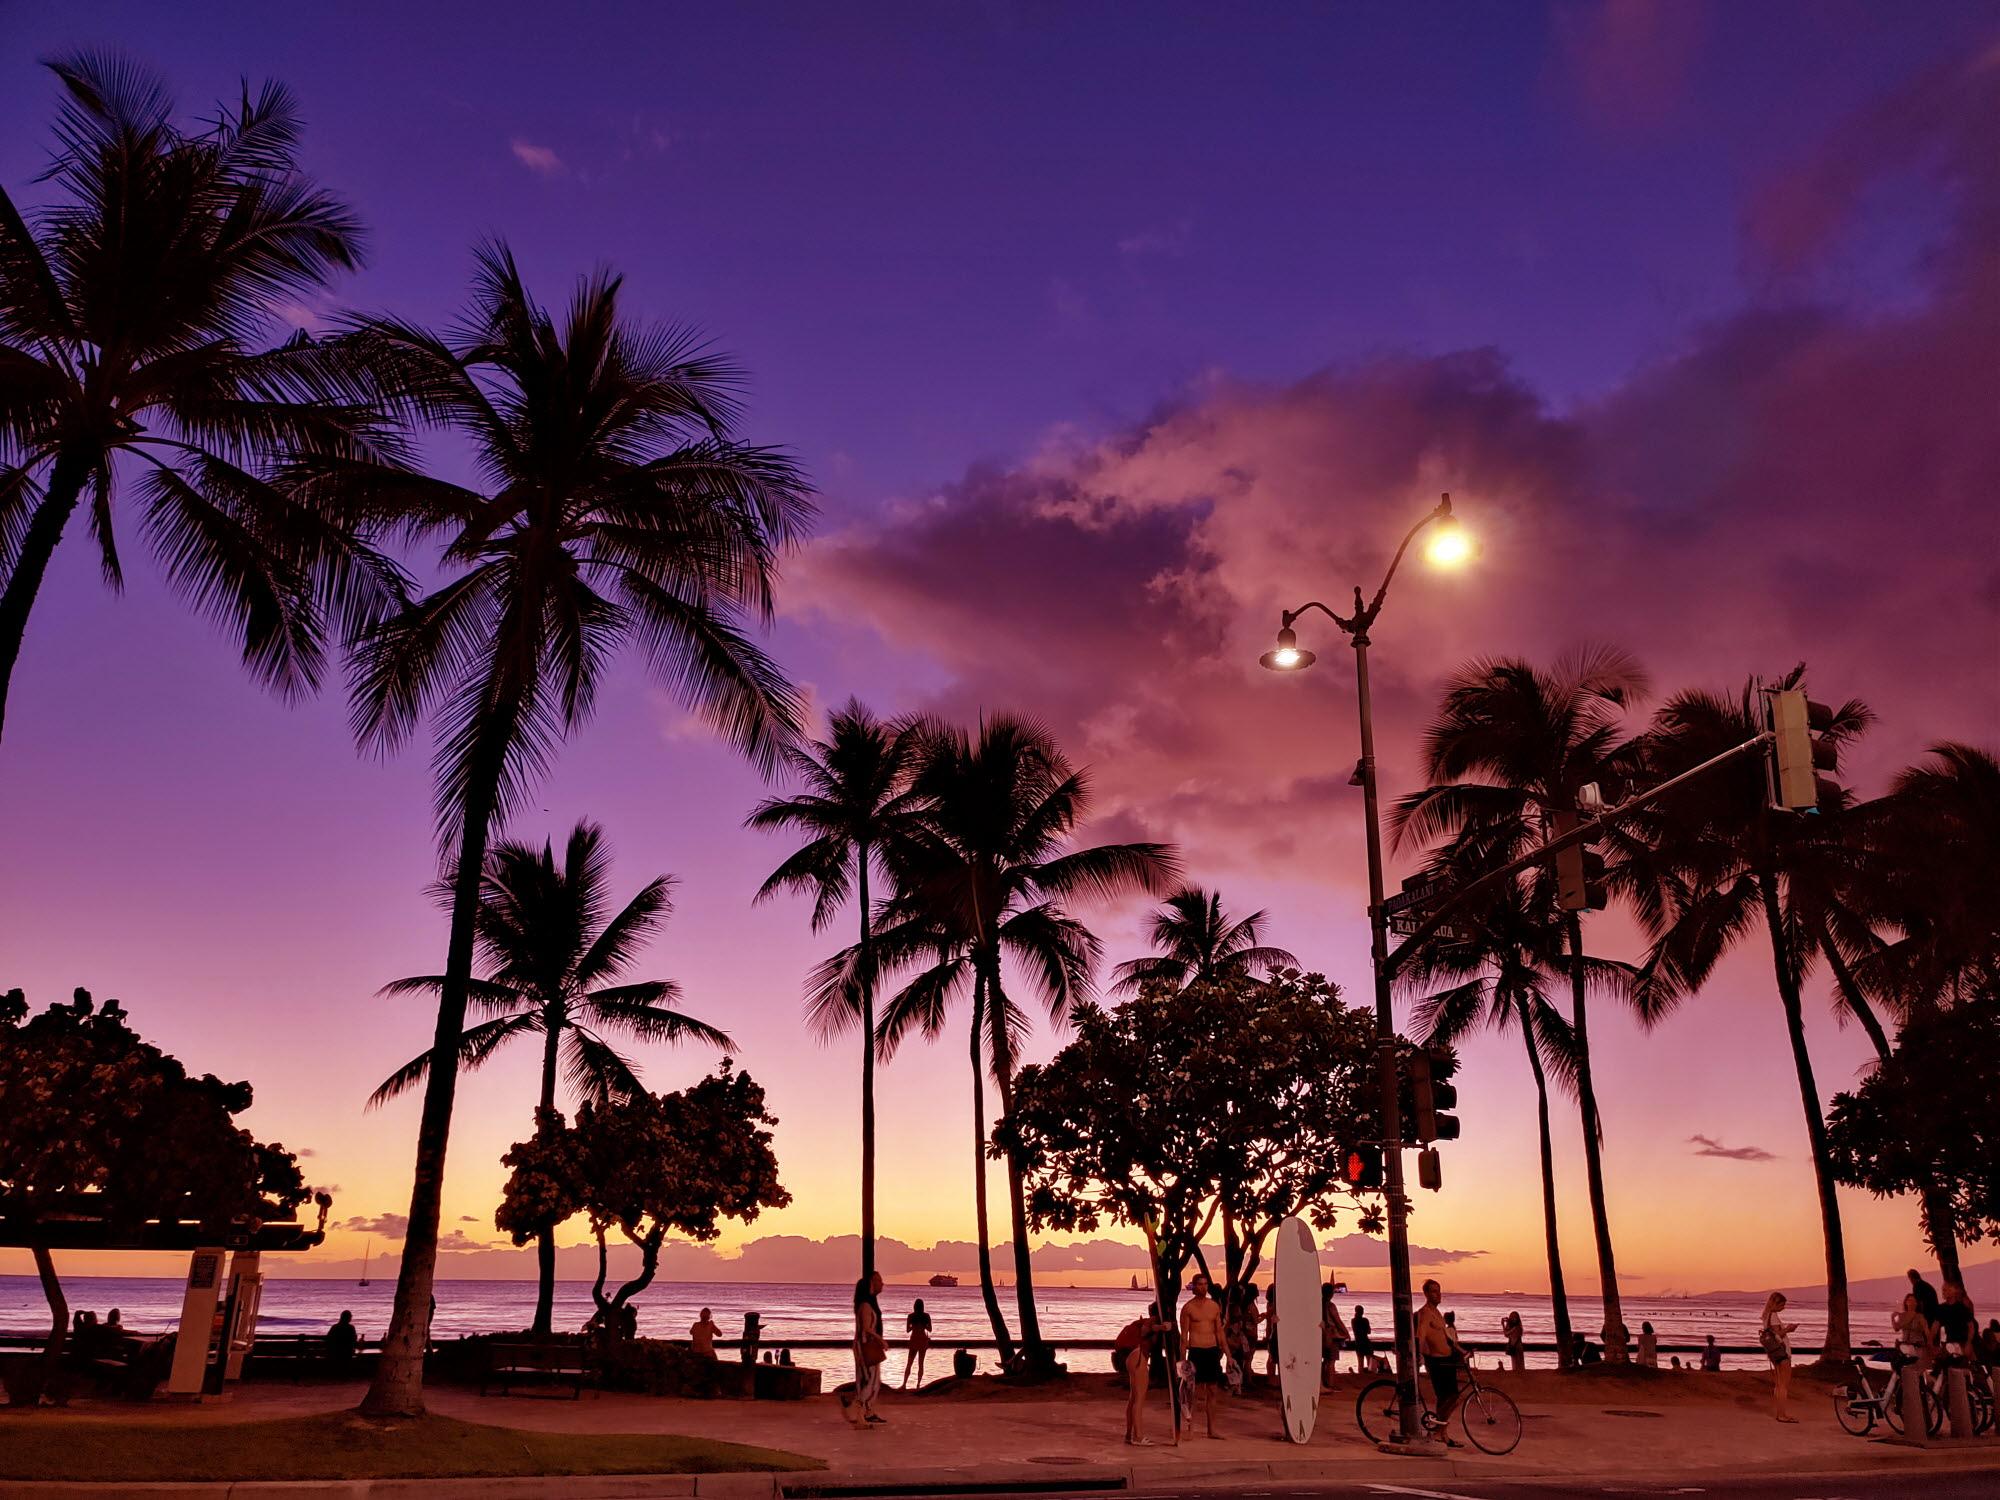 LG V50S ThinQ로 촬영한 하와이의 아름다운 사진 공개